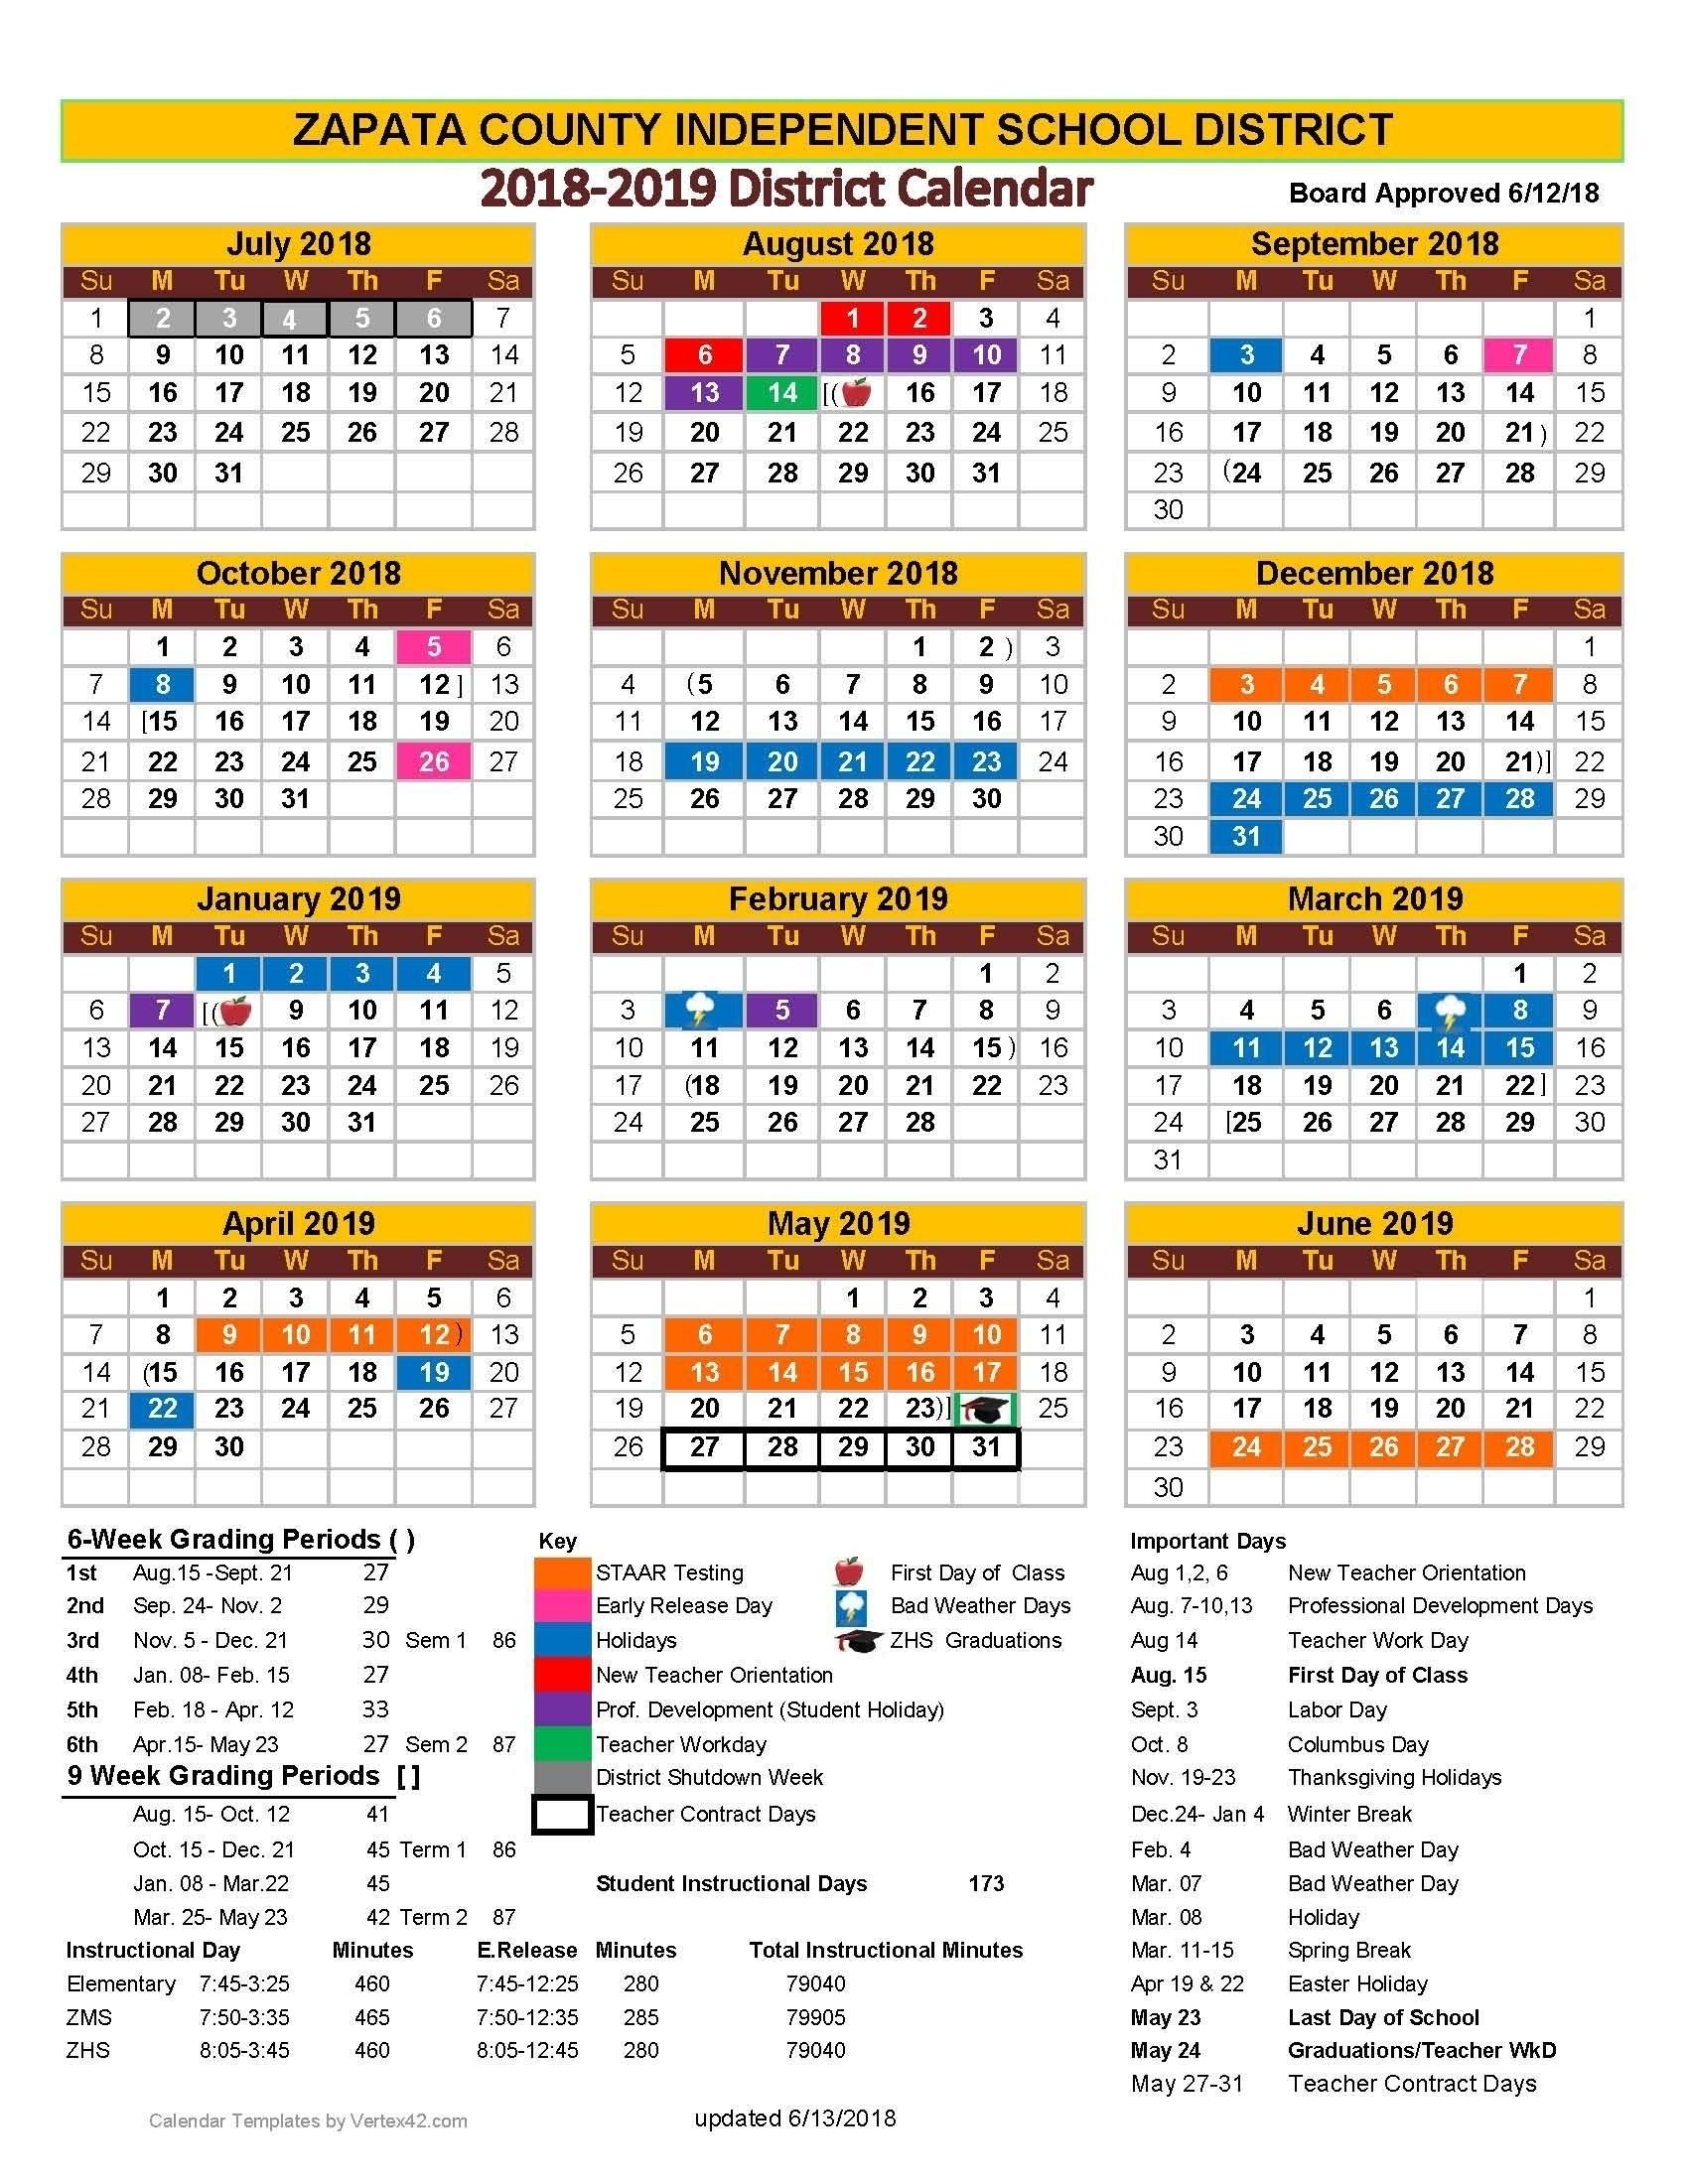 Extraordinary U High School Calendar • Printable Blank Calendar Template_U High School Calendar